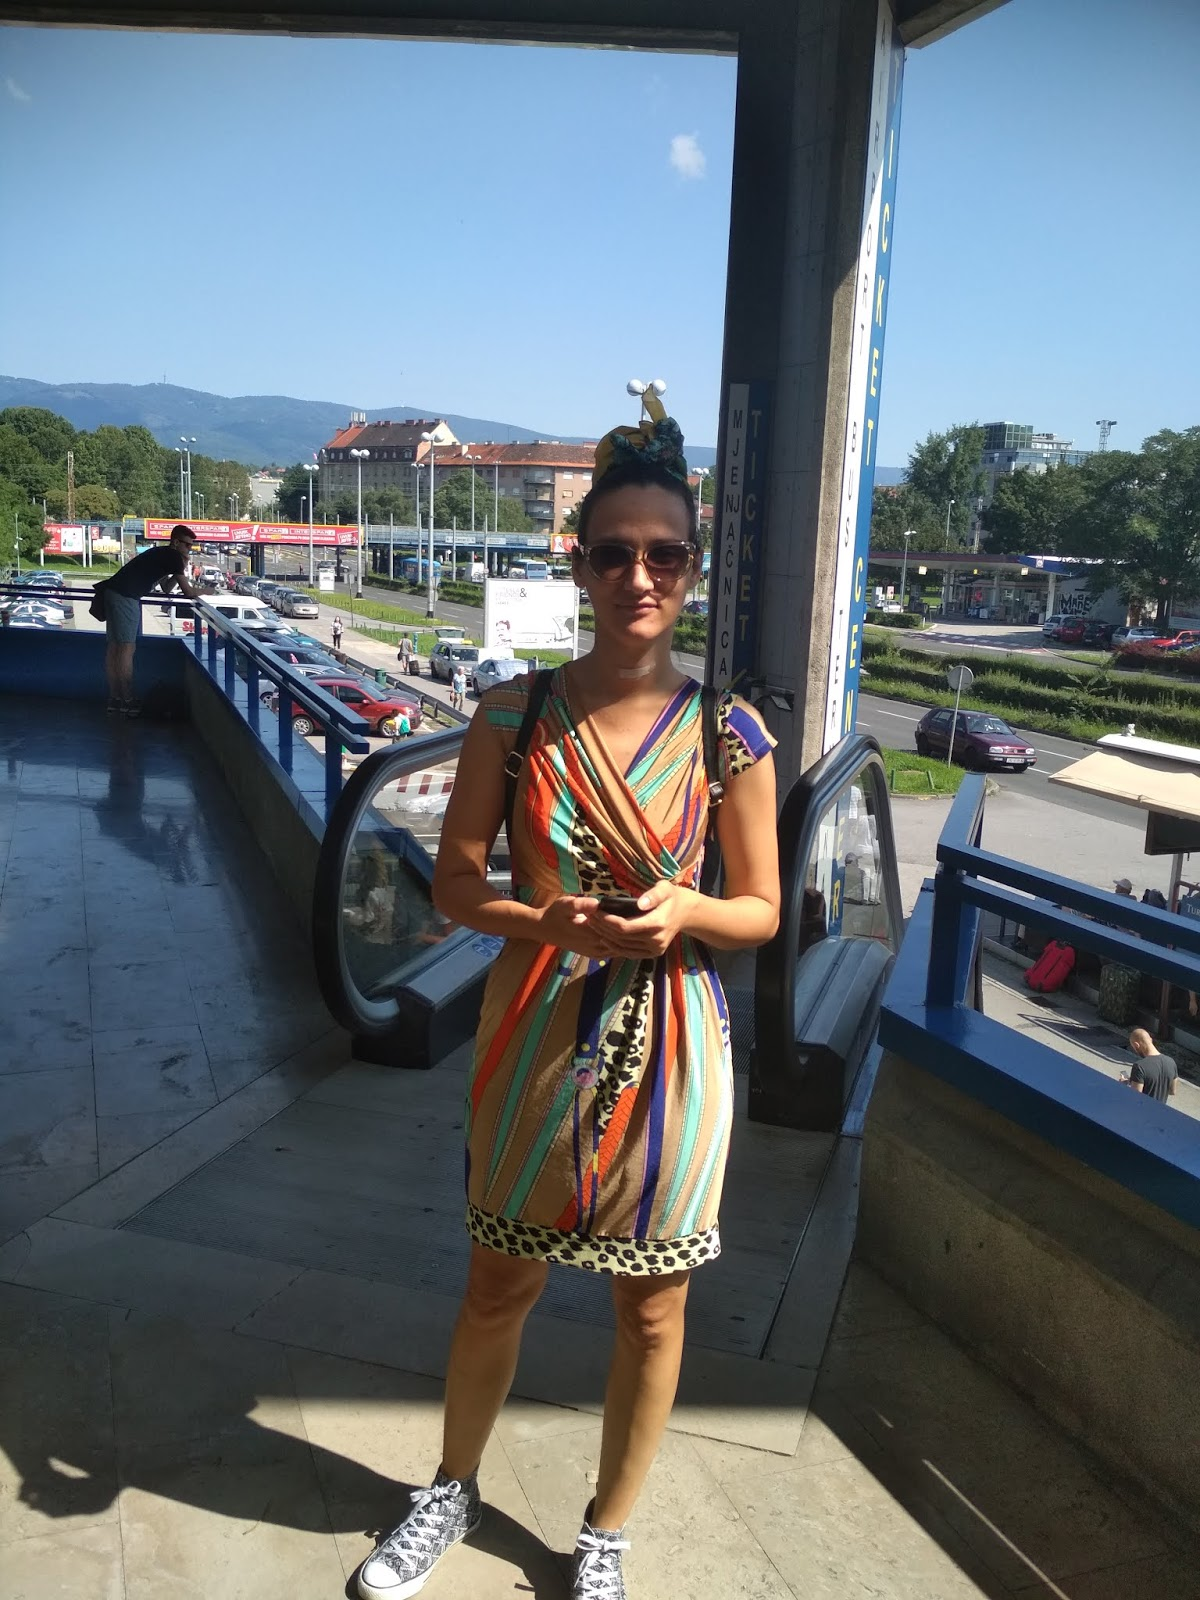 #modaodaradosti #summerdress #printeddress